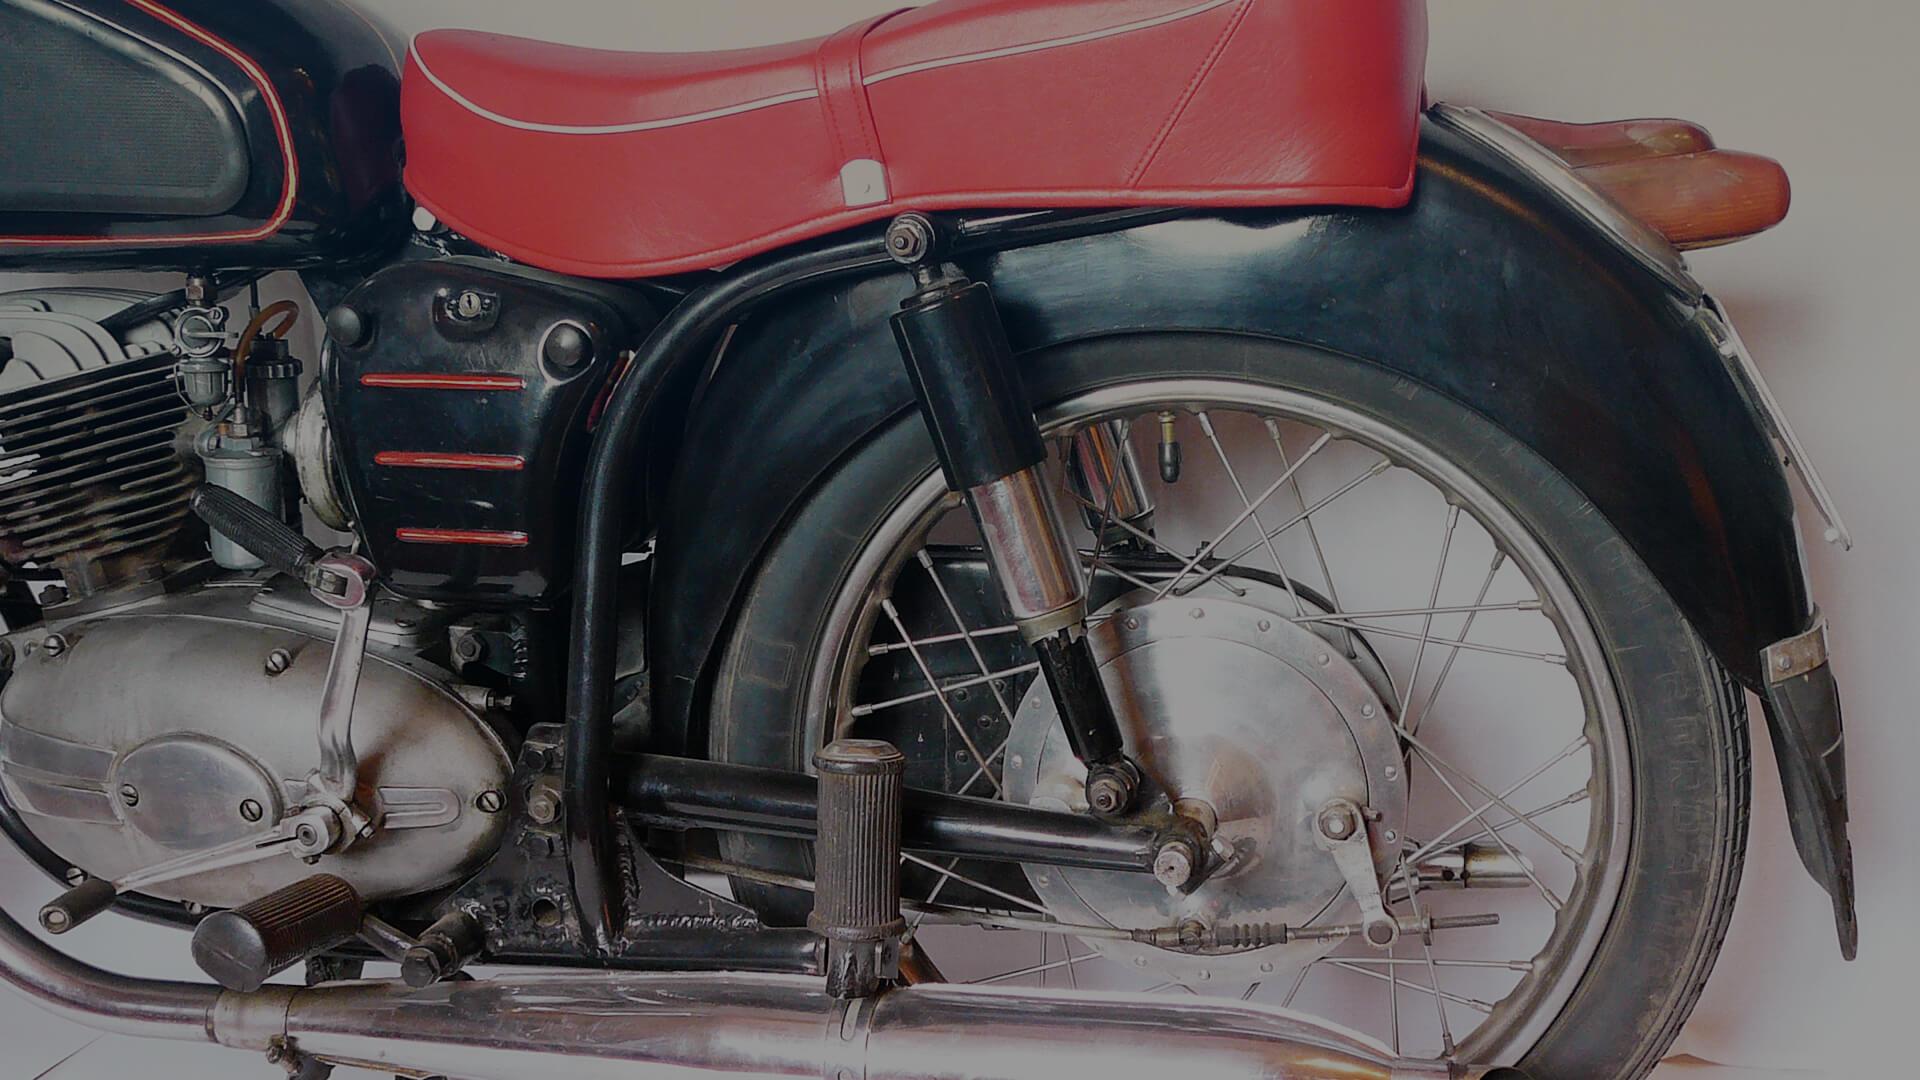 PANNONIA TL-250F, 247 cm³, 1958